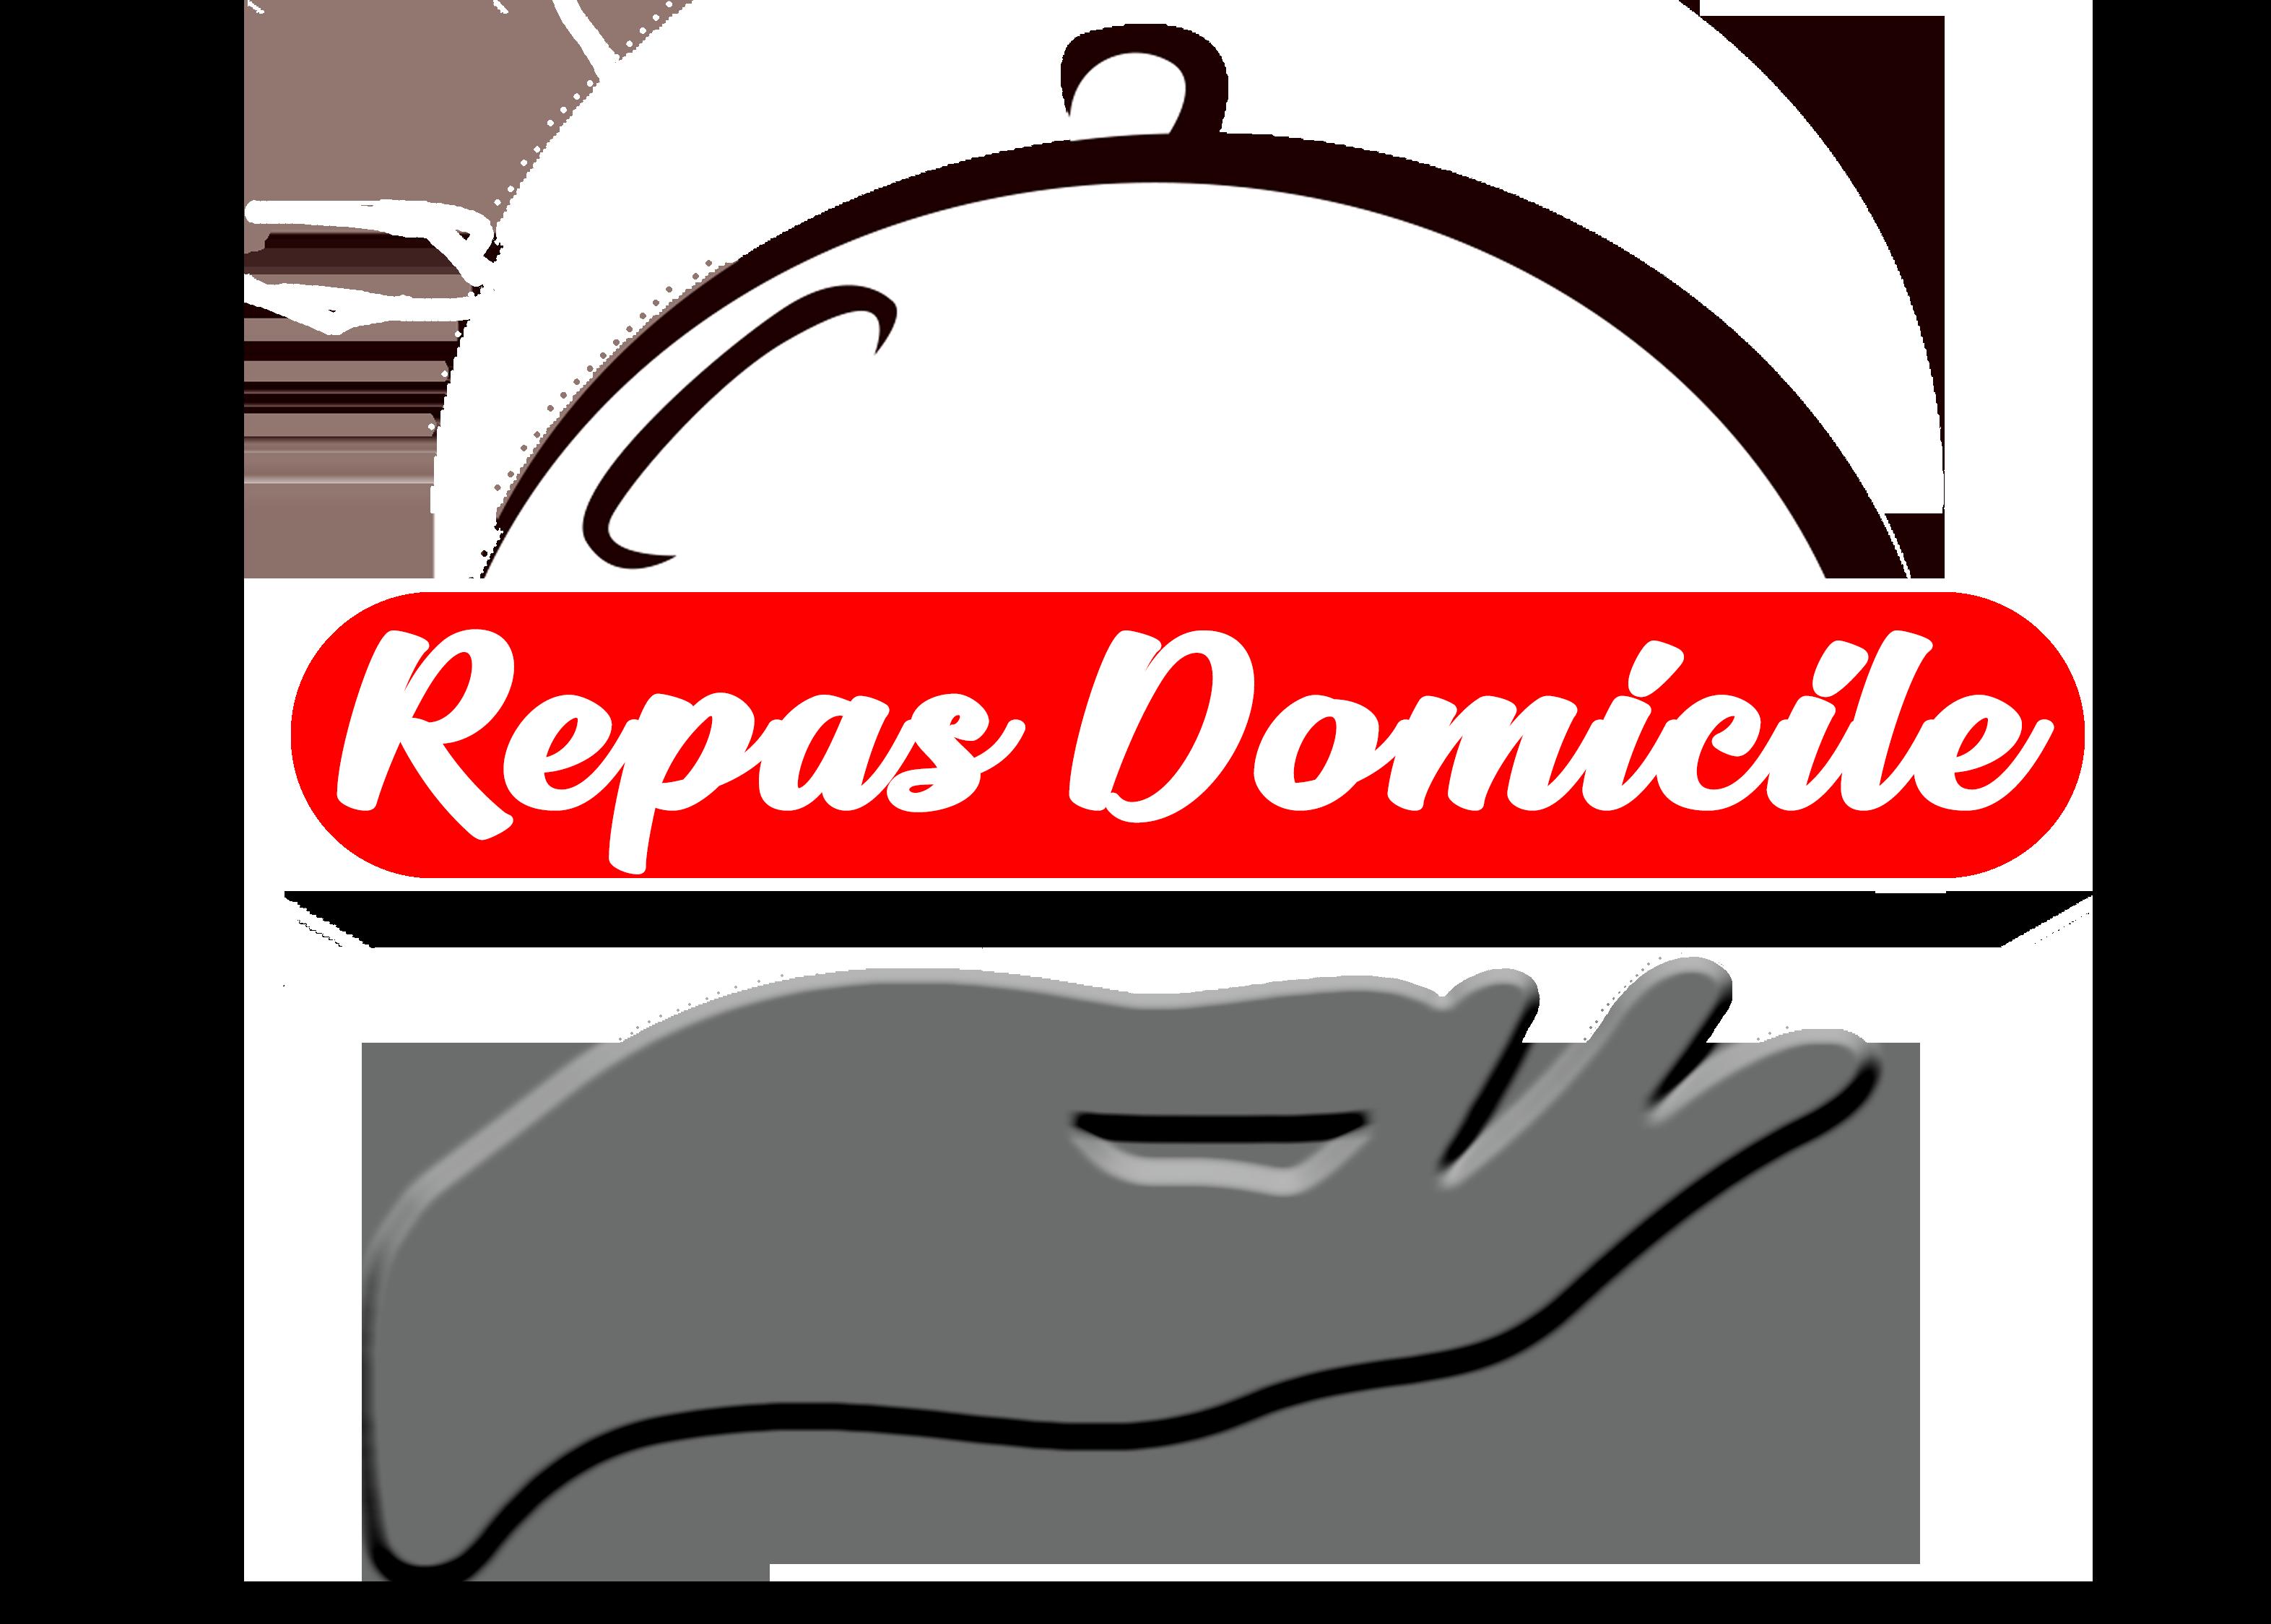 Repas Domicile